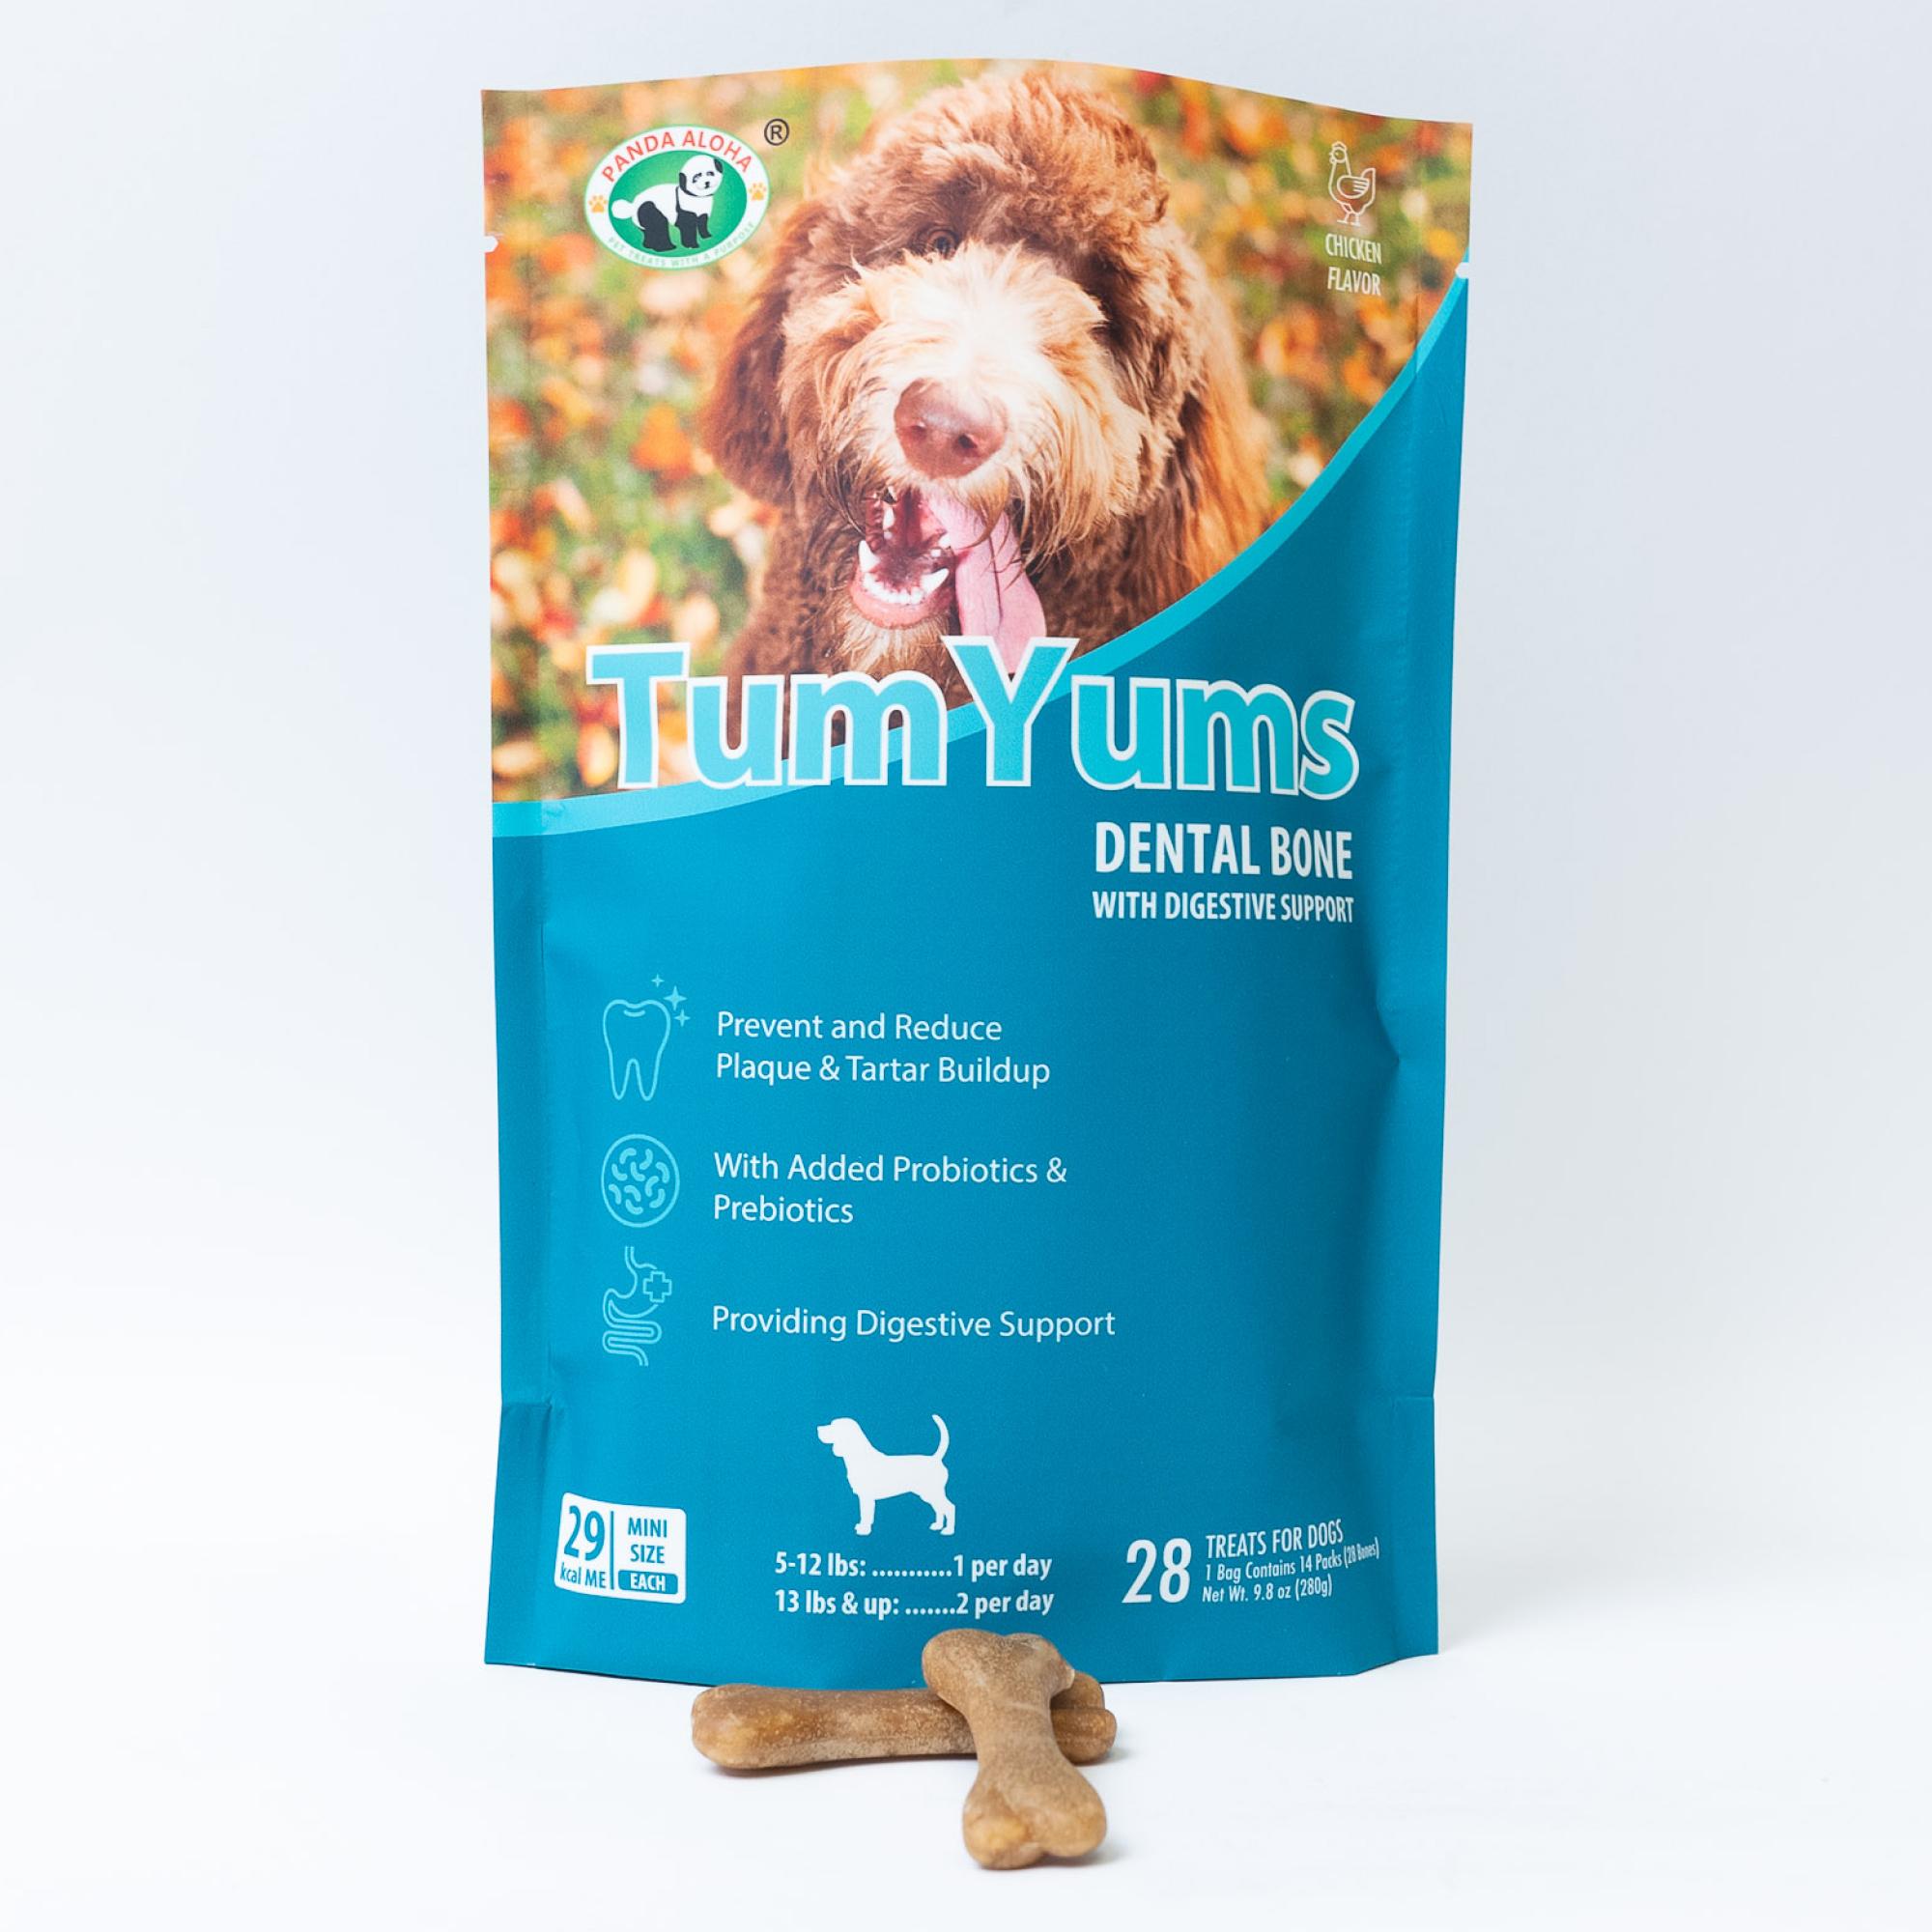 Tum Yums Dental Bone With Digestive Support